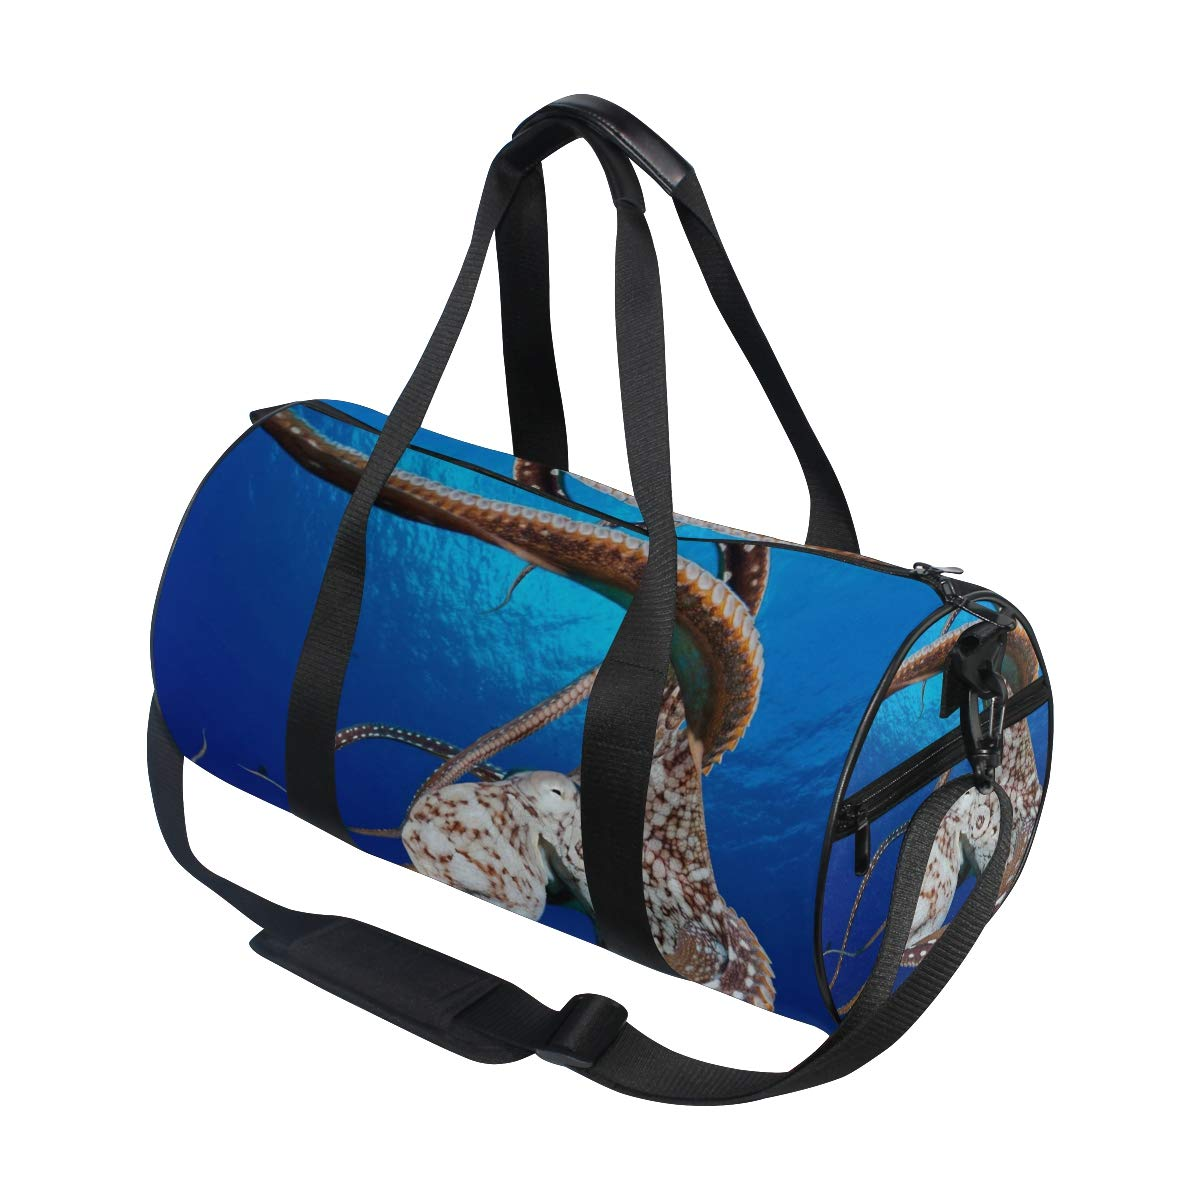 Gym Bag Dolphin Women Canvas Duffel Bag Cute Sports Bag for Girls